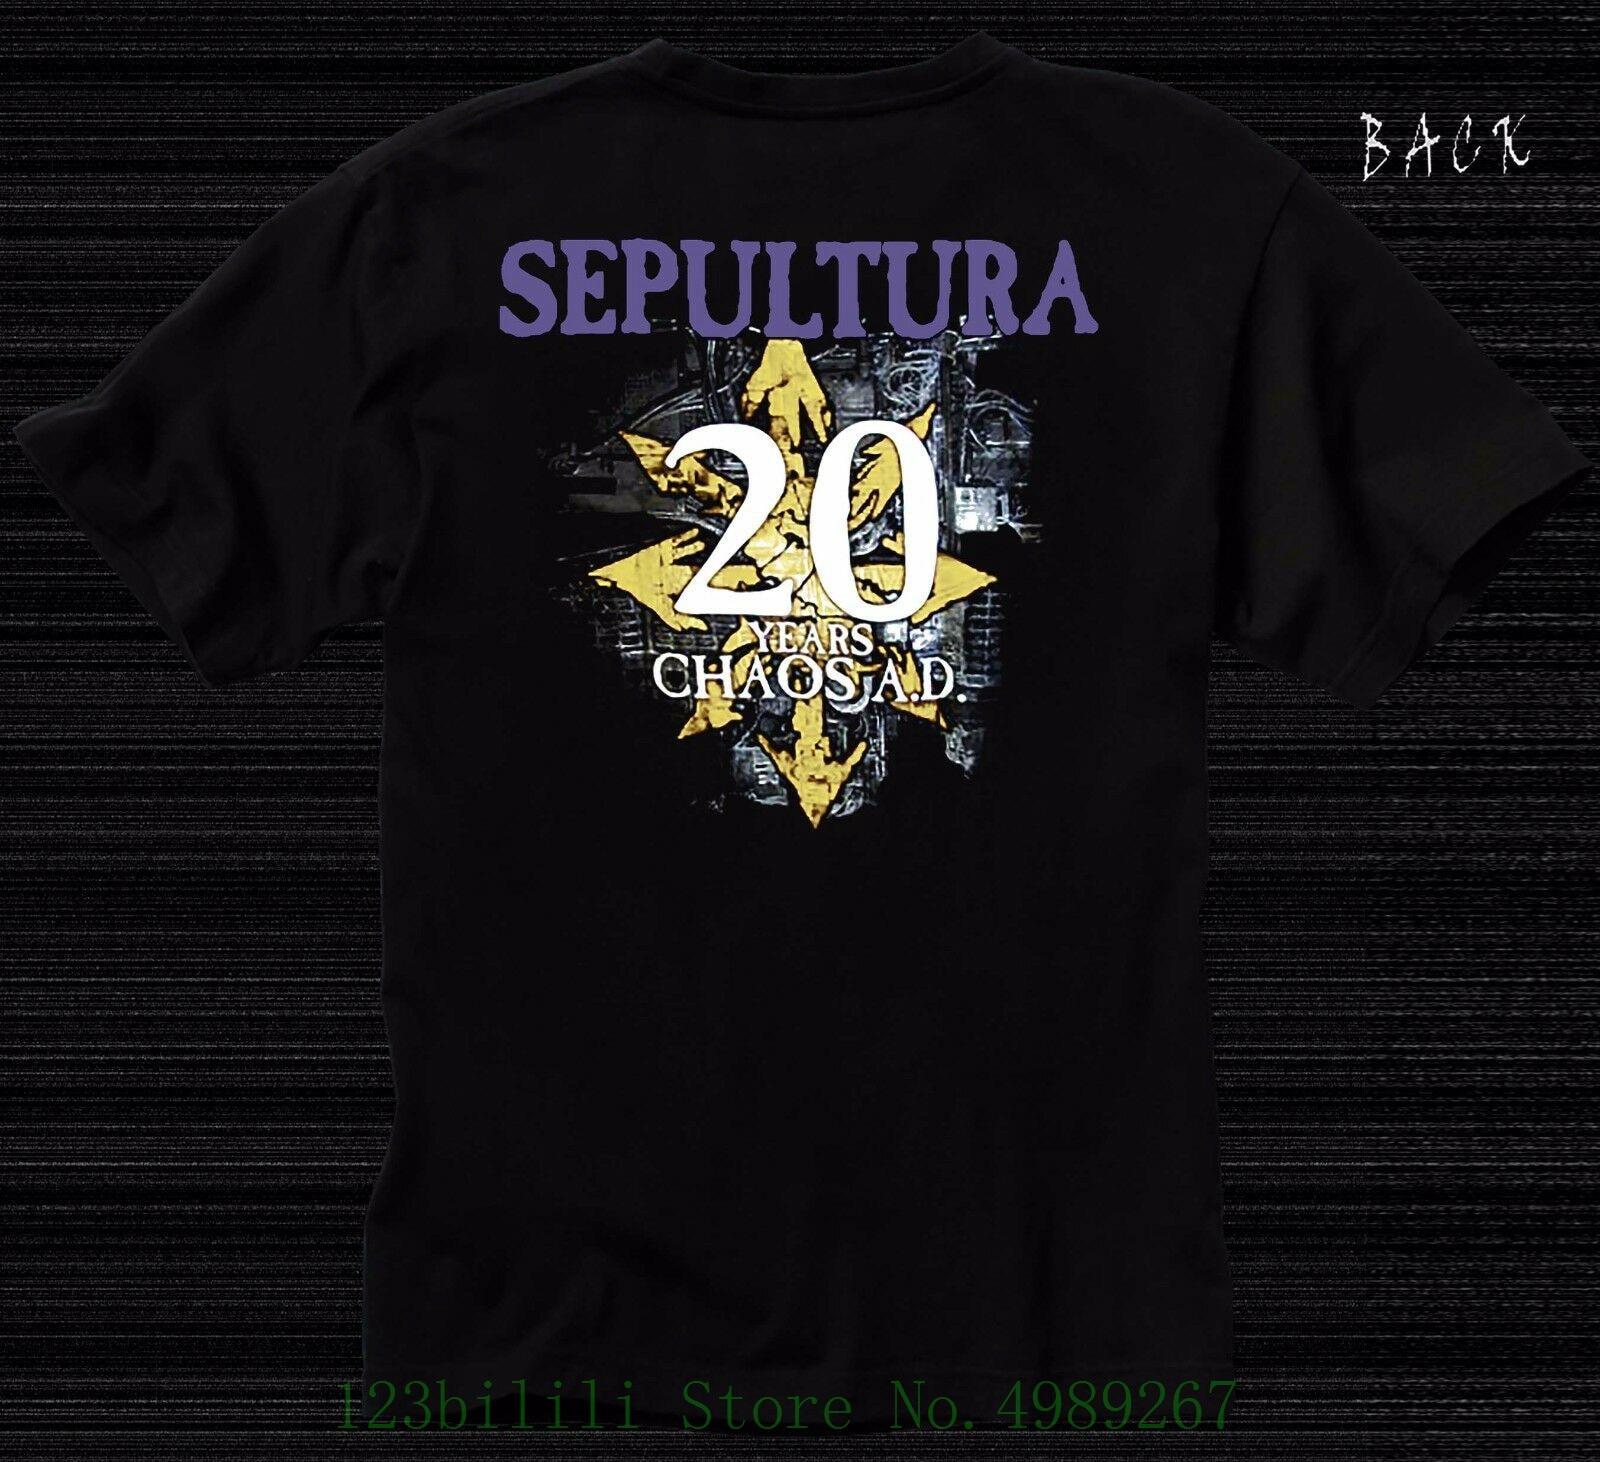 Sepultura Brazilian Heavy Metal Band New T-Shirt Cotton 100/%